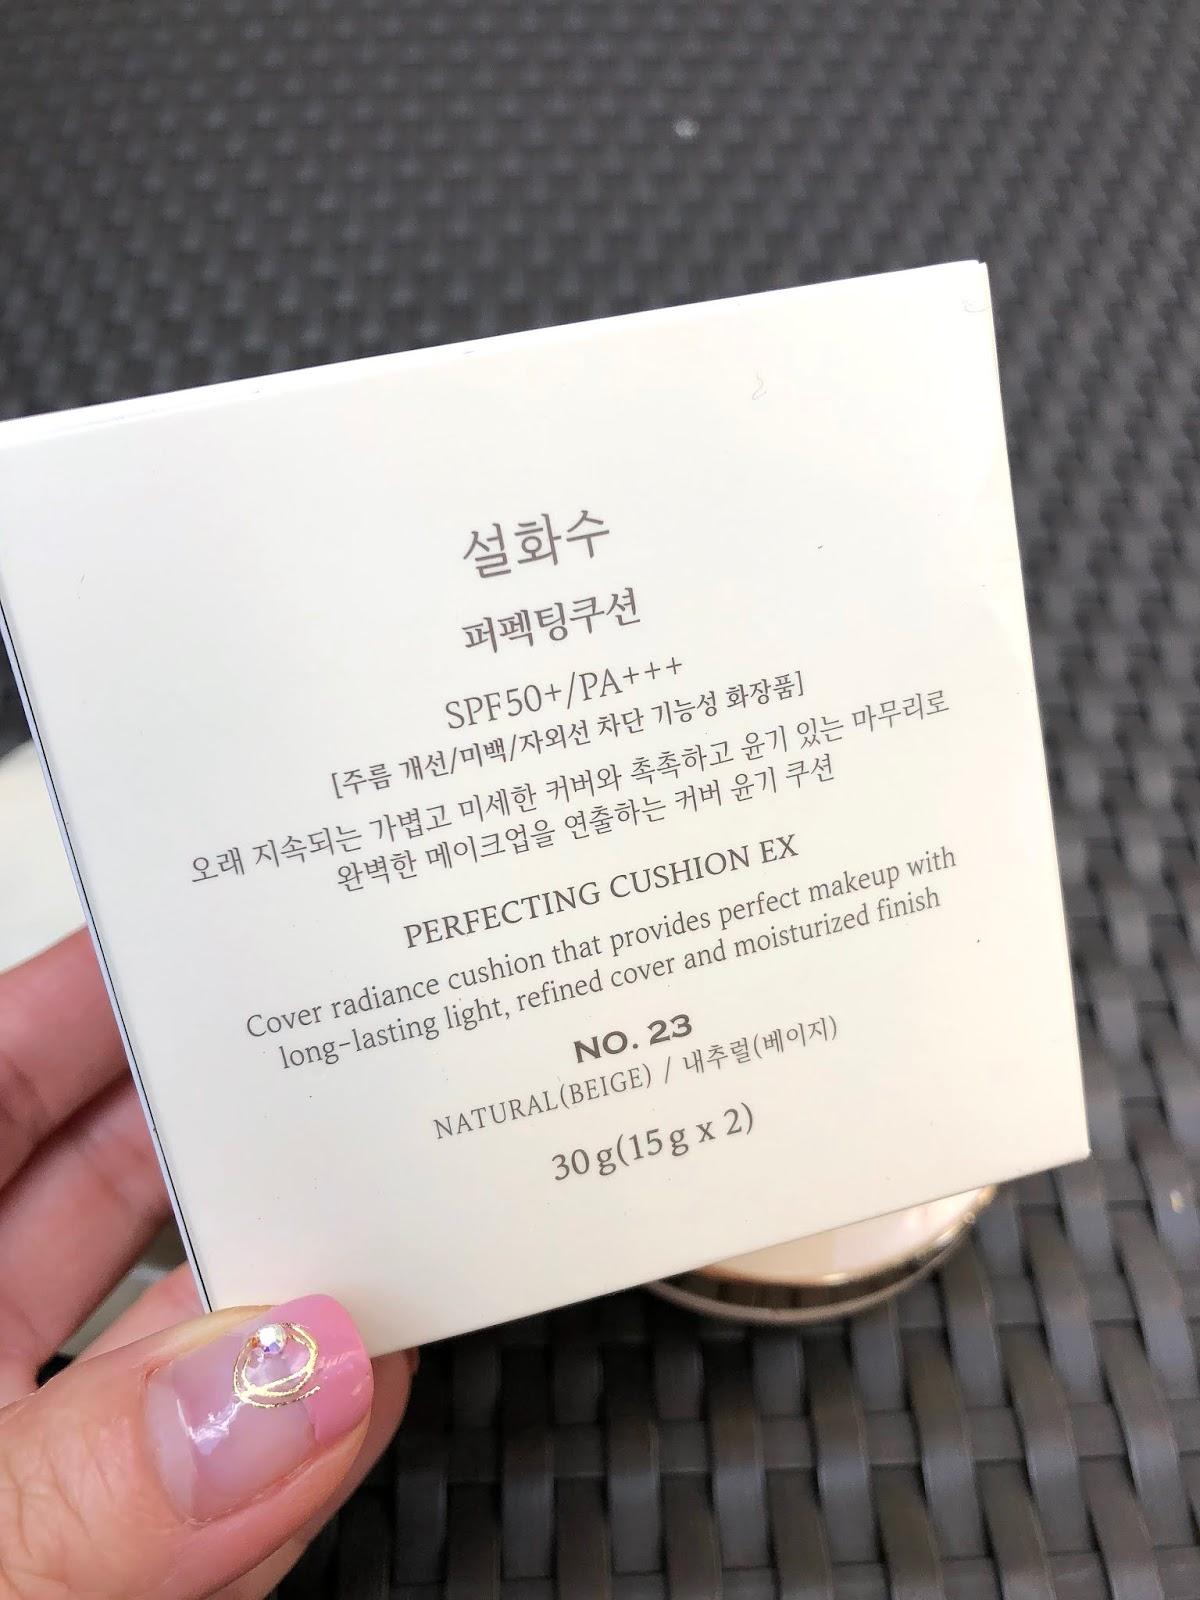 Makeup Secret: 雪花秀 Sulwhasoo 第 2 代昇華版「Perfecting Cushion EX 緻美無瑕氣墊粉底」用後感